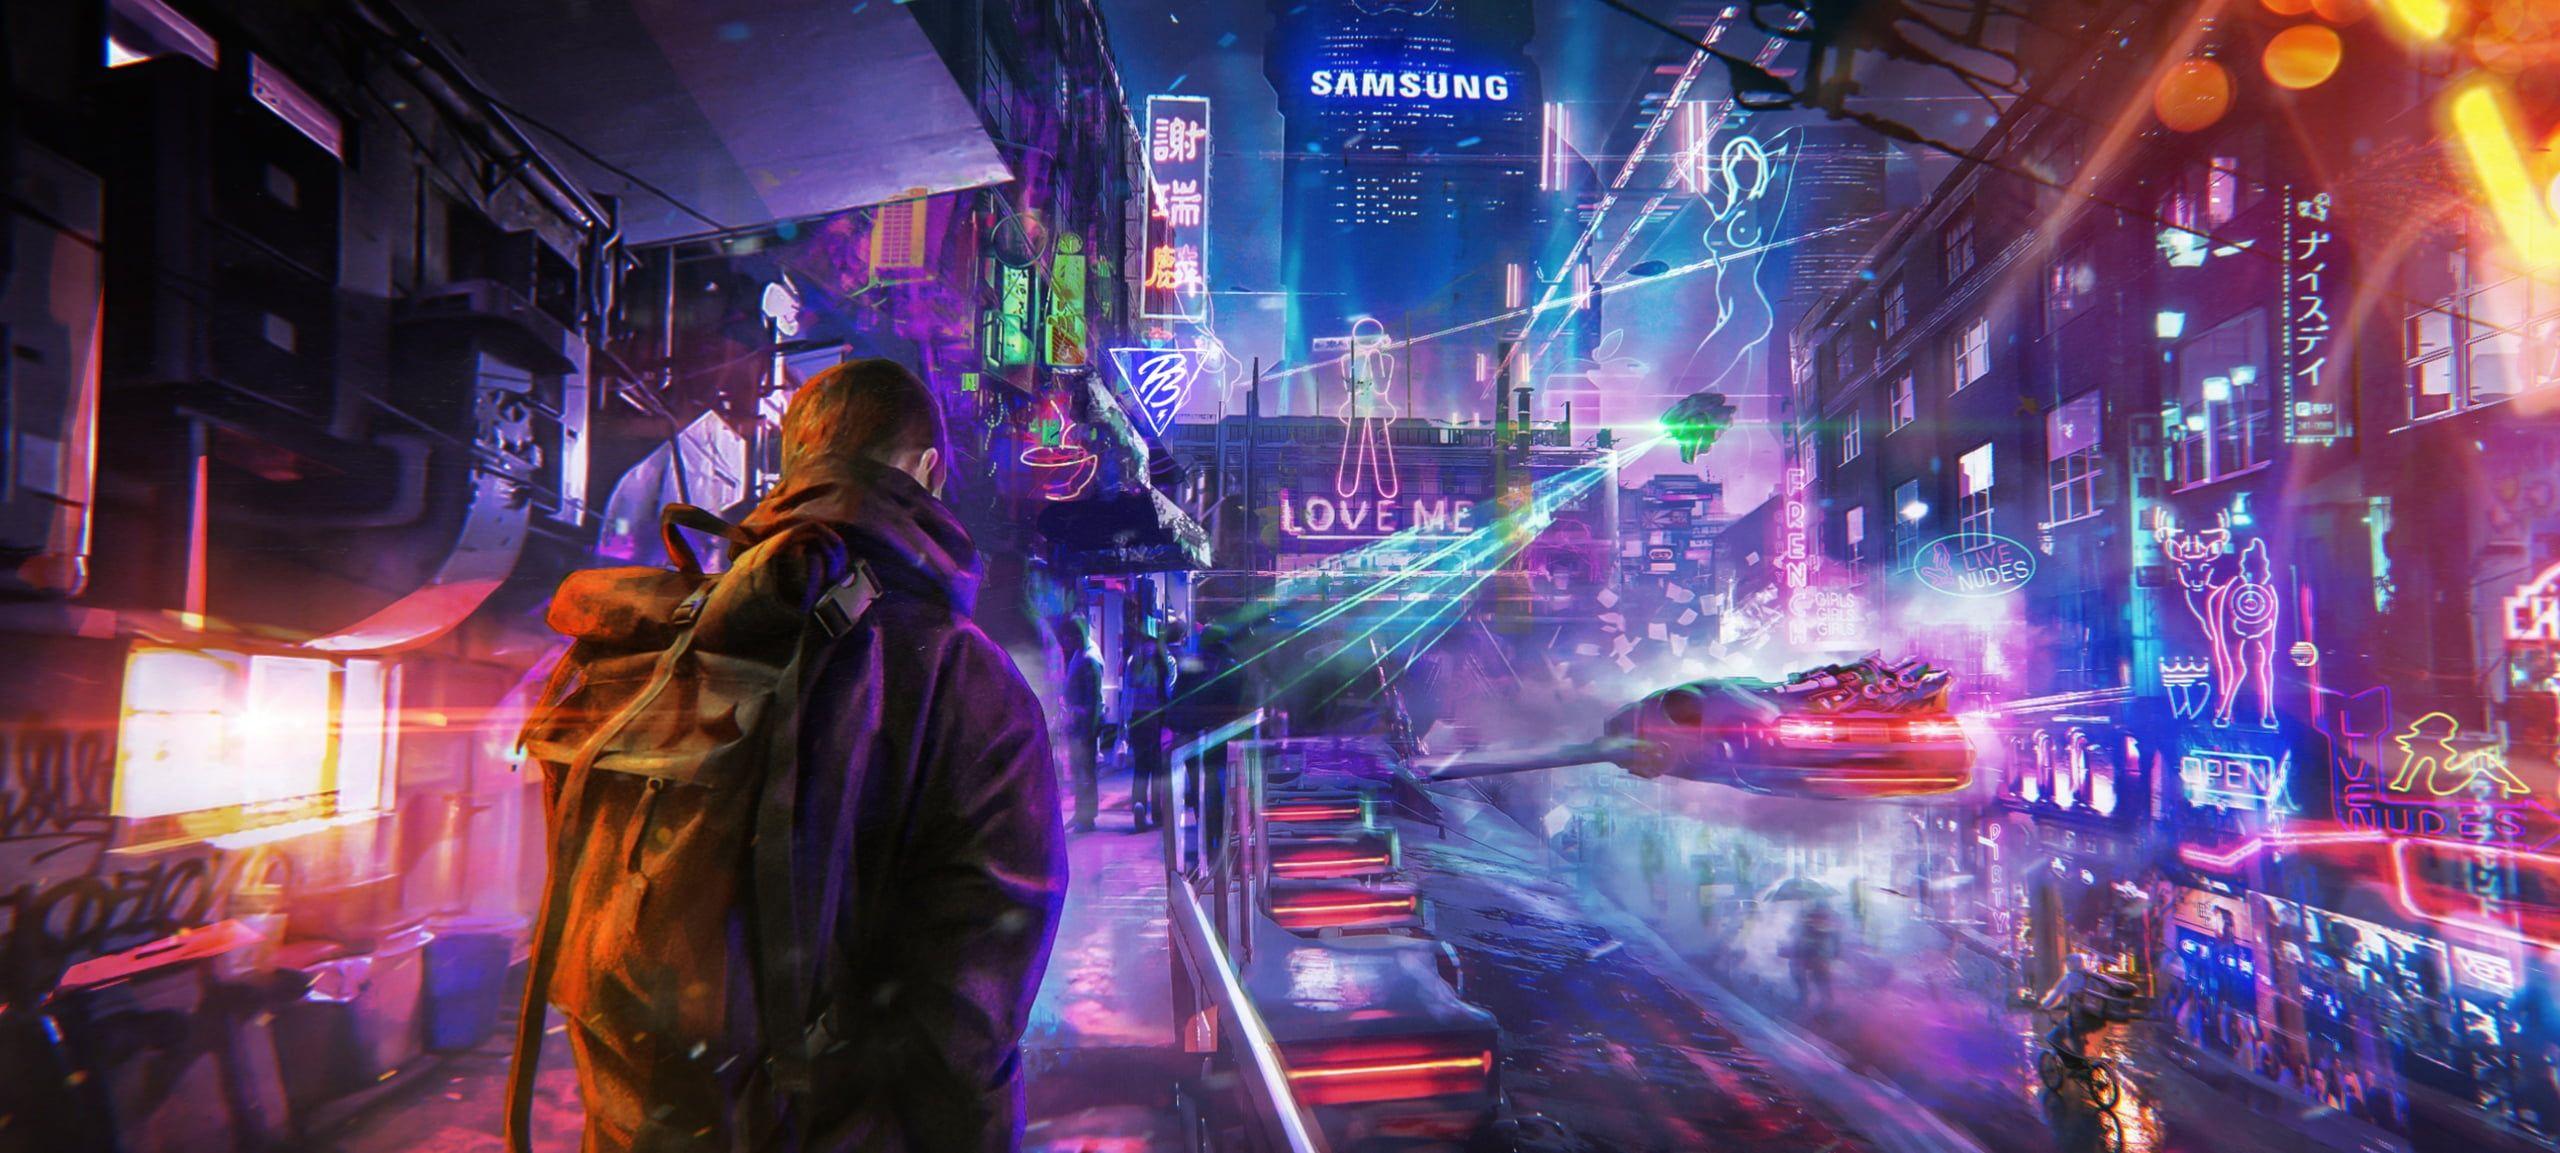 Men Jacket Backpacks Futuristic Futuristic City City Cyberpunk Artwork Digital Art Photoshop People Night S In 2020 Futuristic City Cyberpunk City Cyberpunk